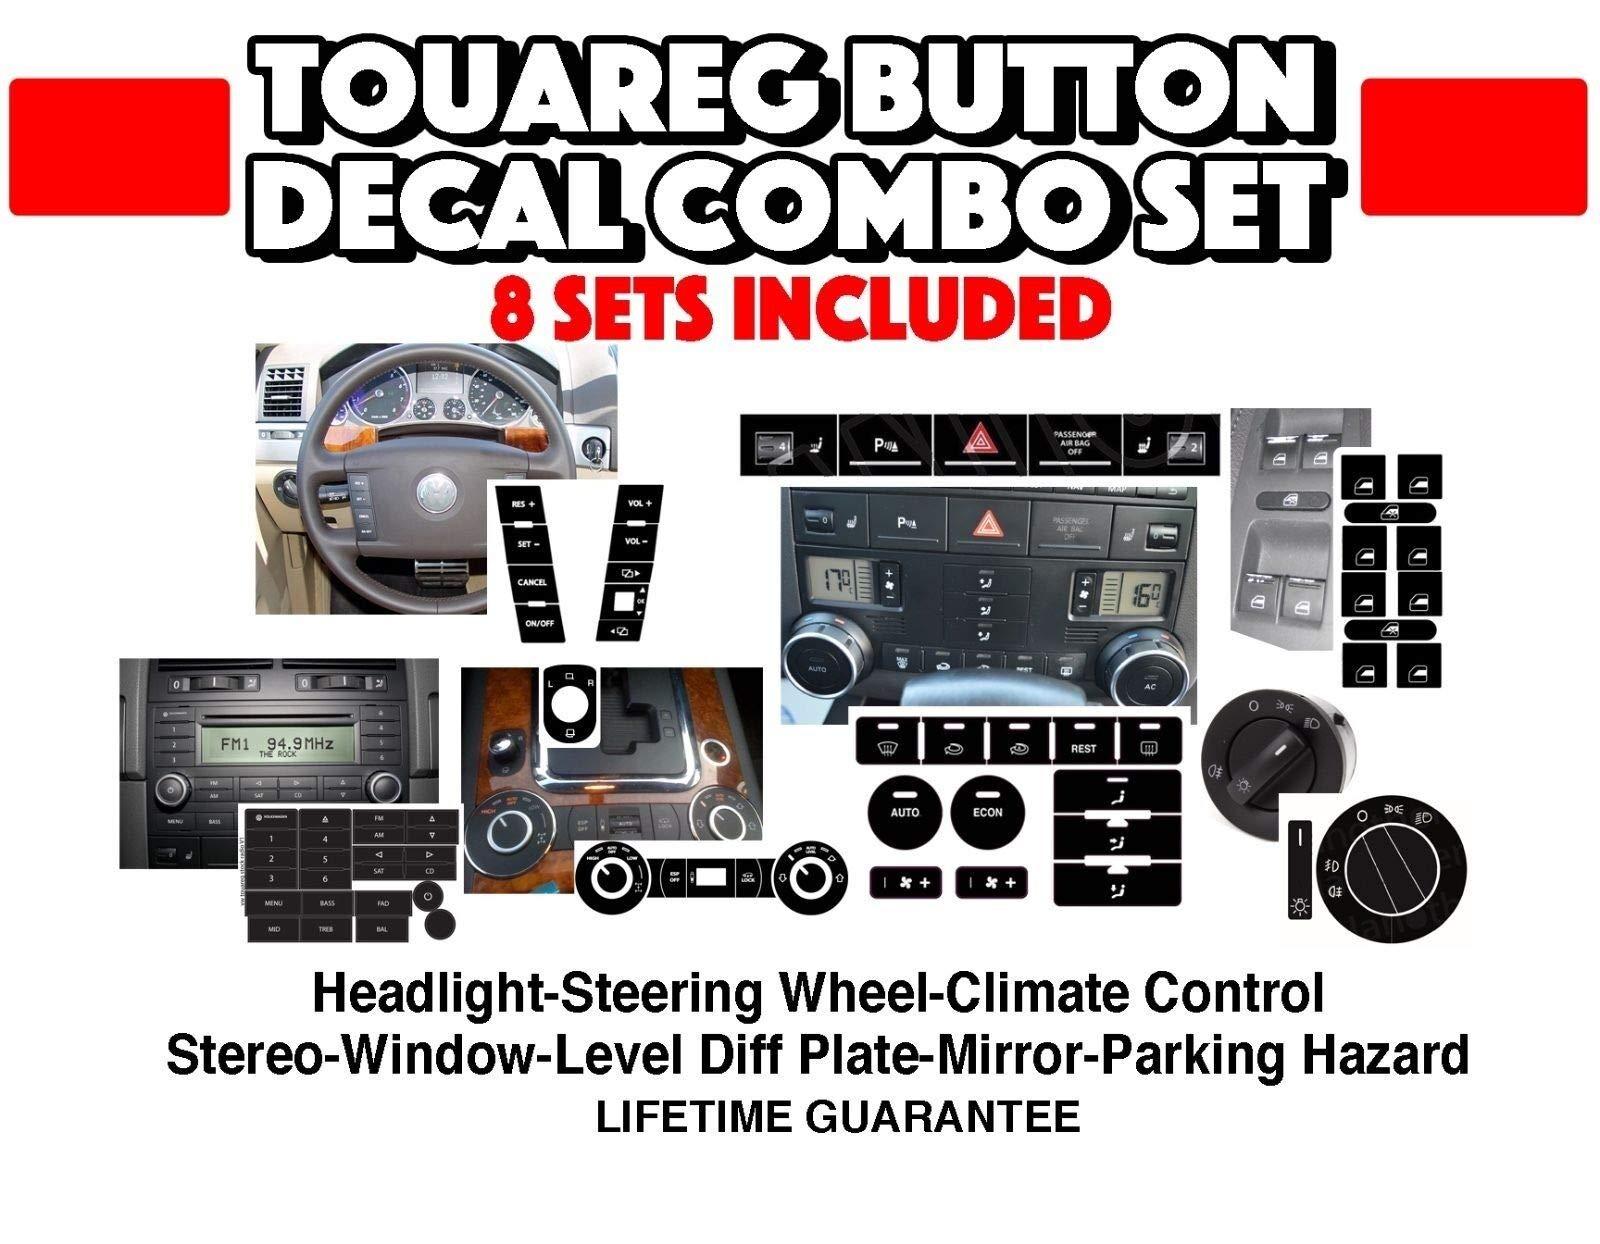 Fits VW Touareg Set of Decals Radio AC Window Buttons Steering Wheel Hazard